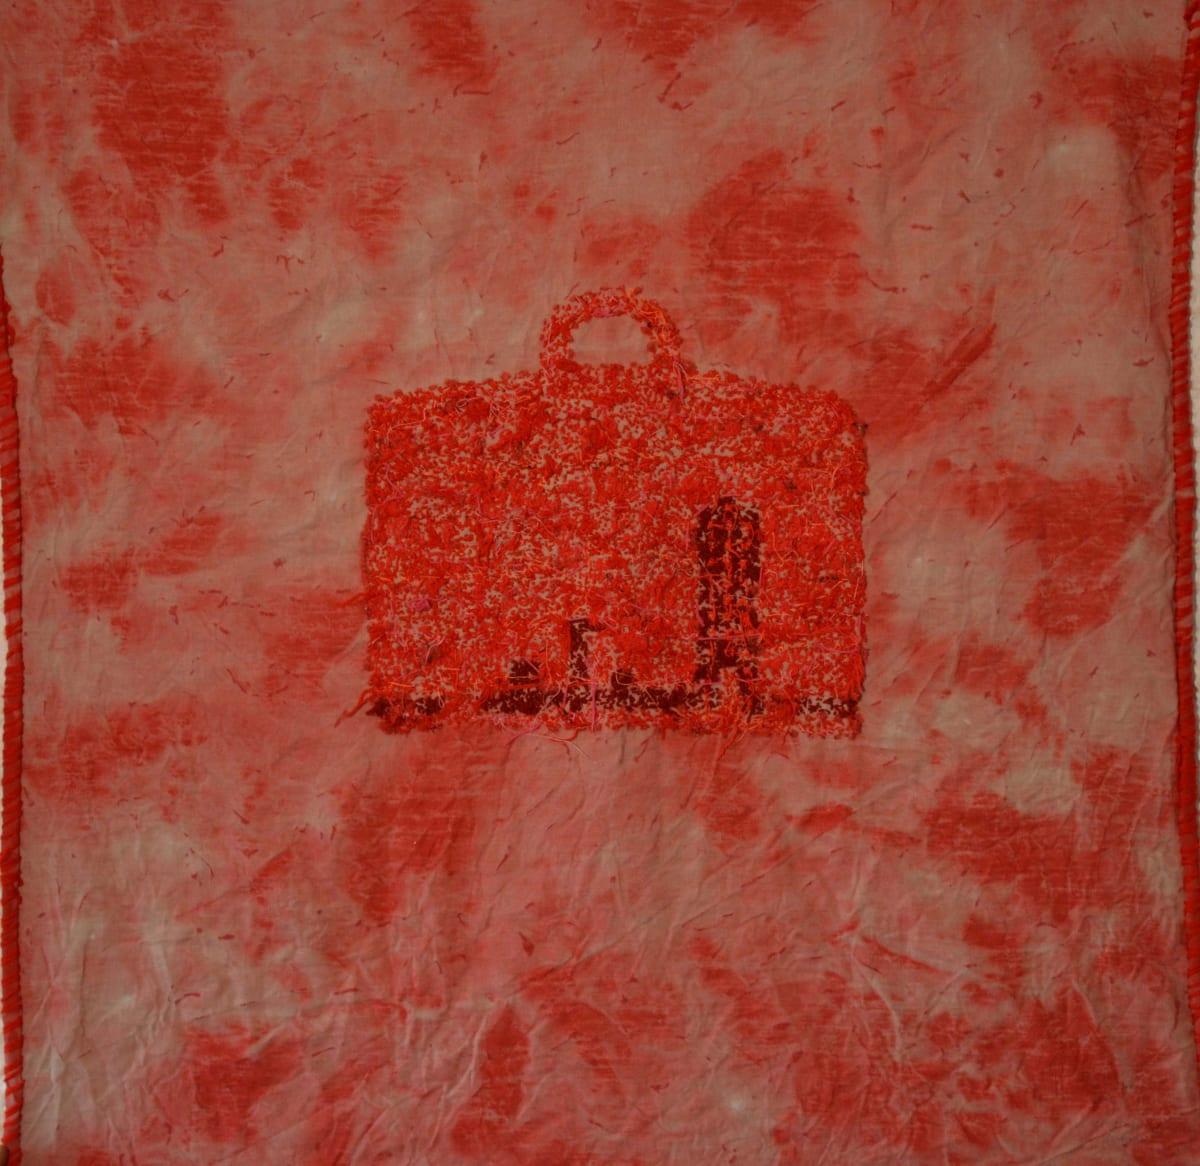 Stephen Eastaugh Impedimental Baggage (Vietnam) acrylic, thread, linen 140 x 140 cm